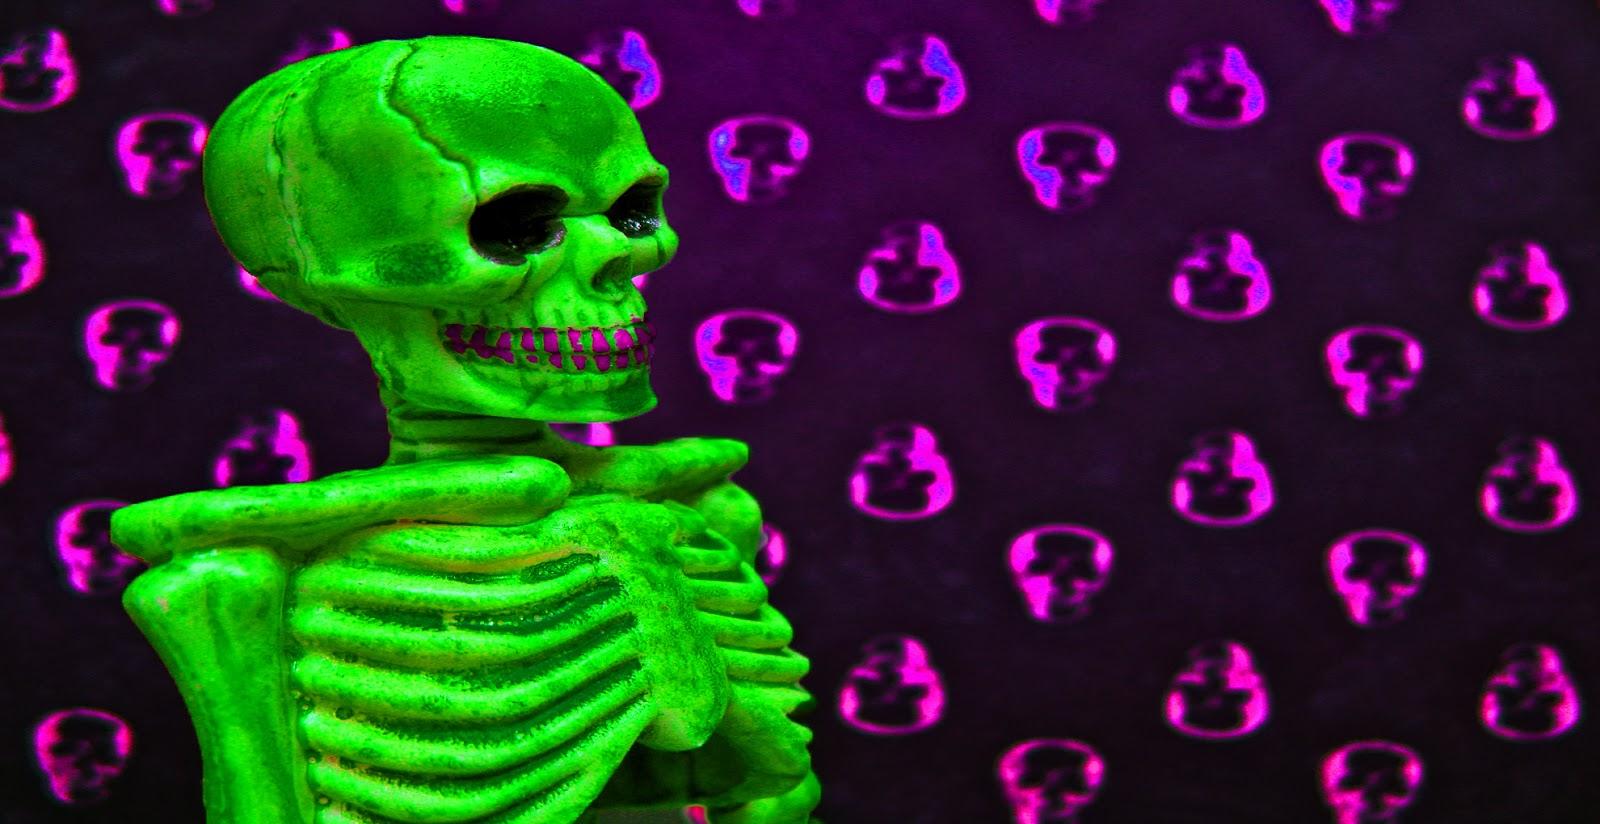 halloween skeleton wallpaper - photo #27